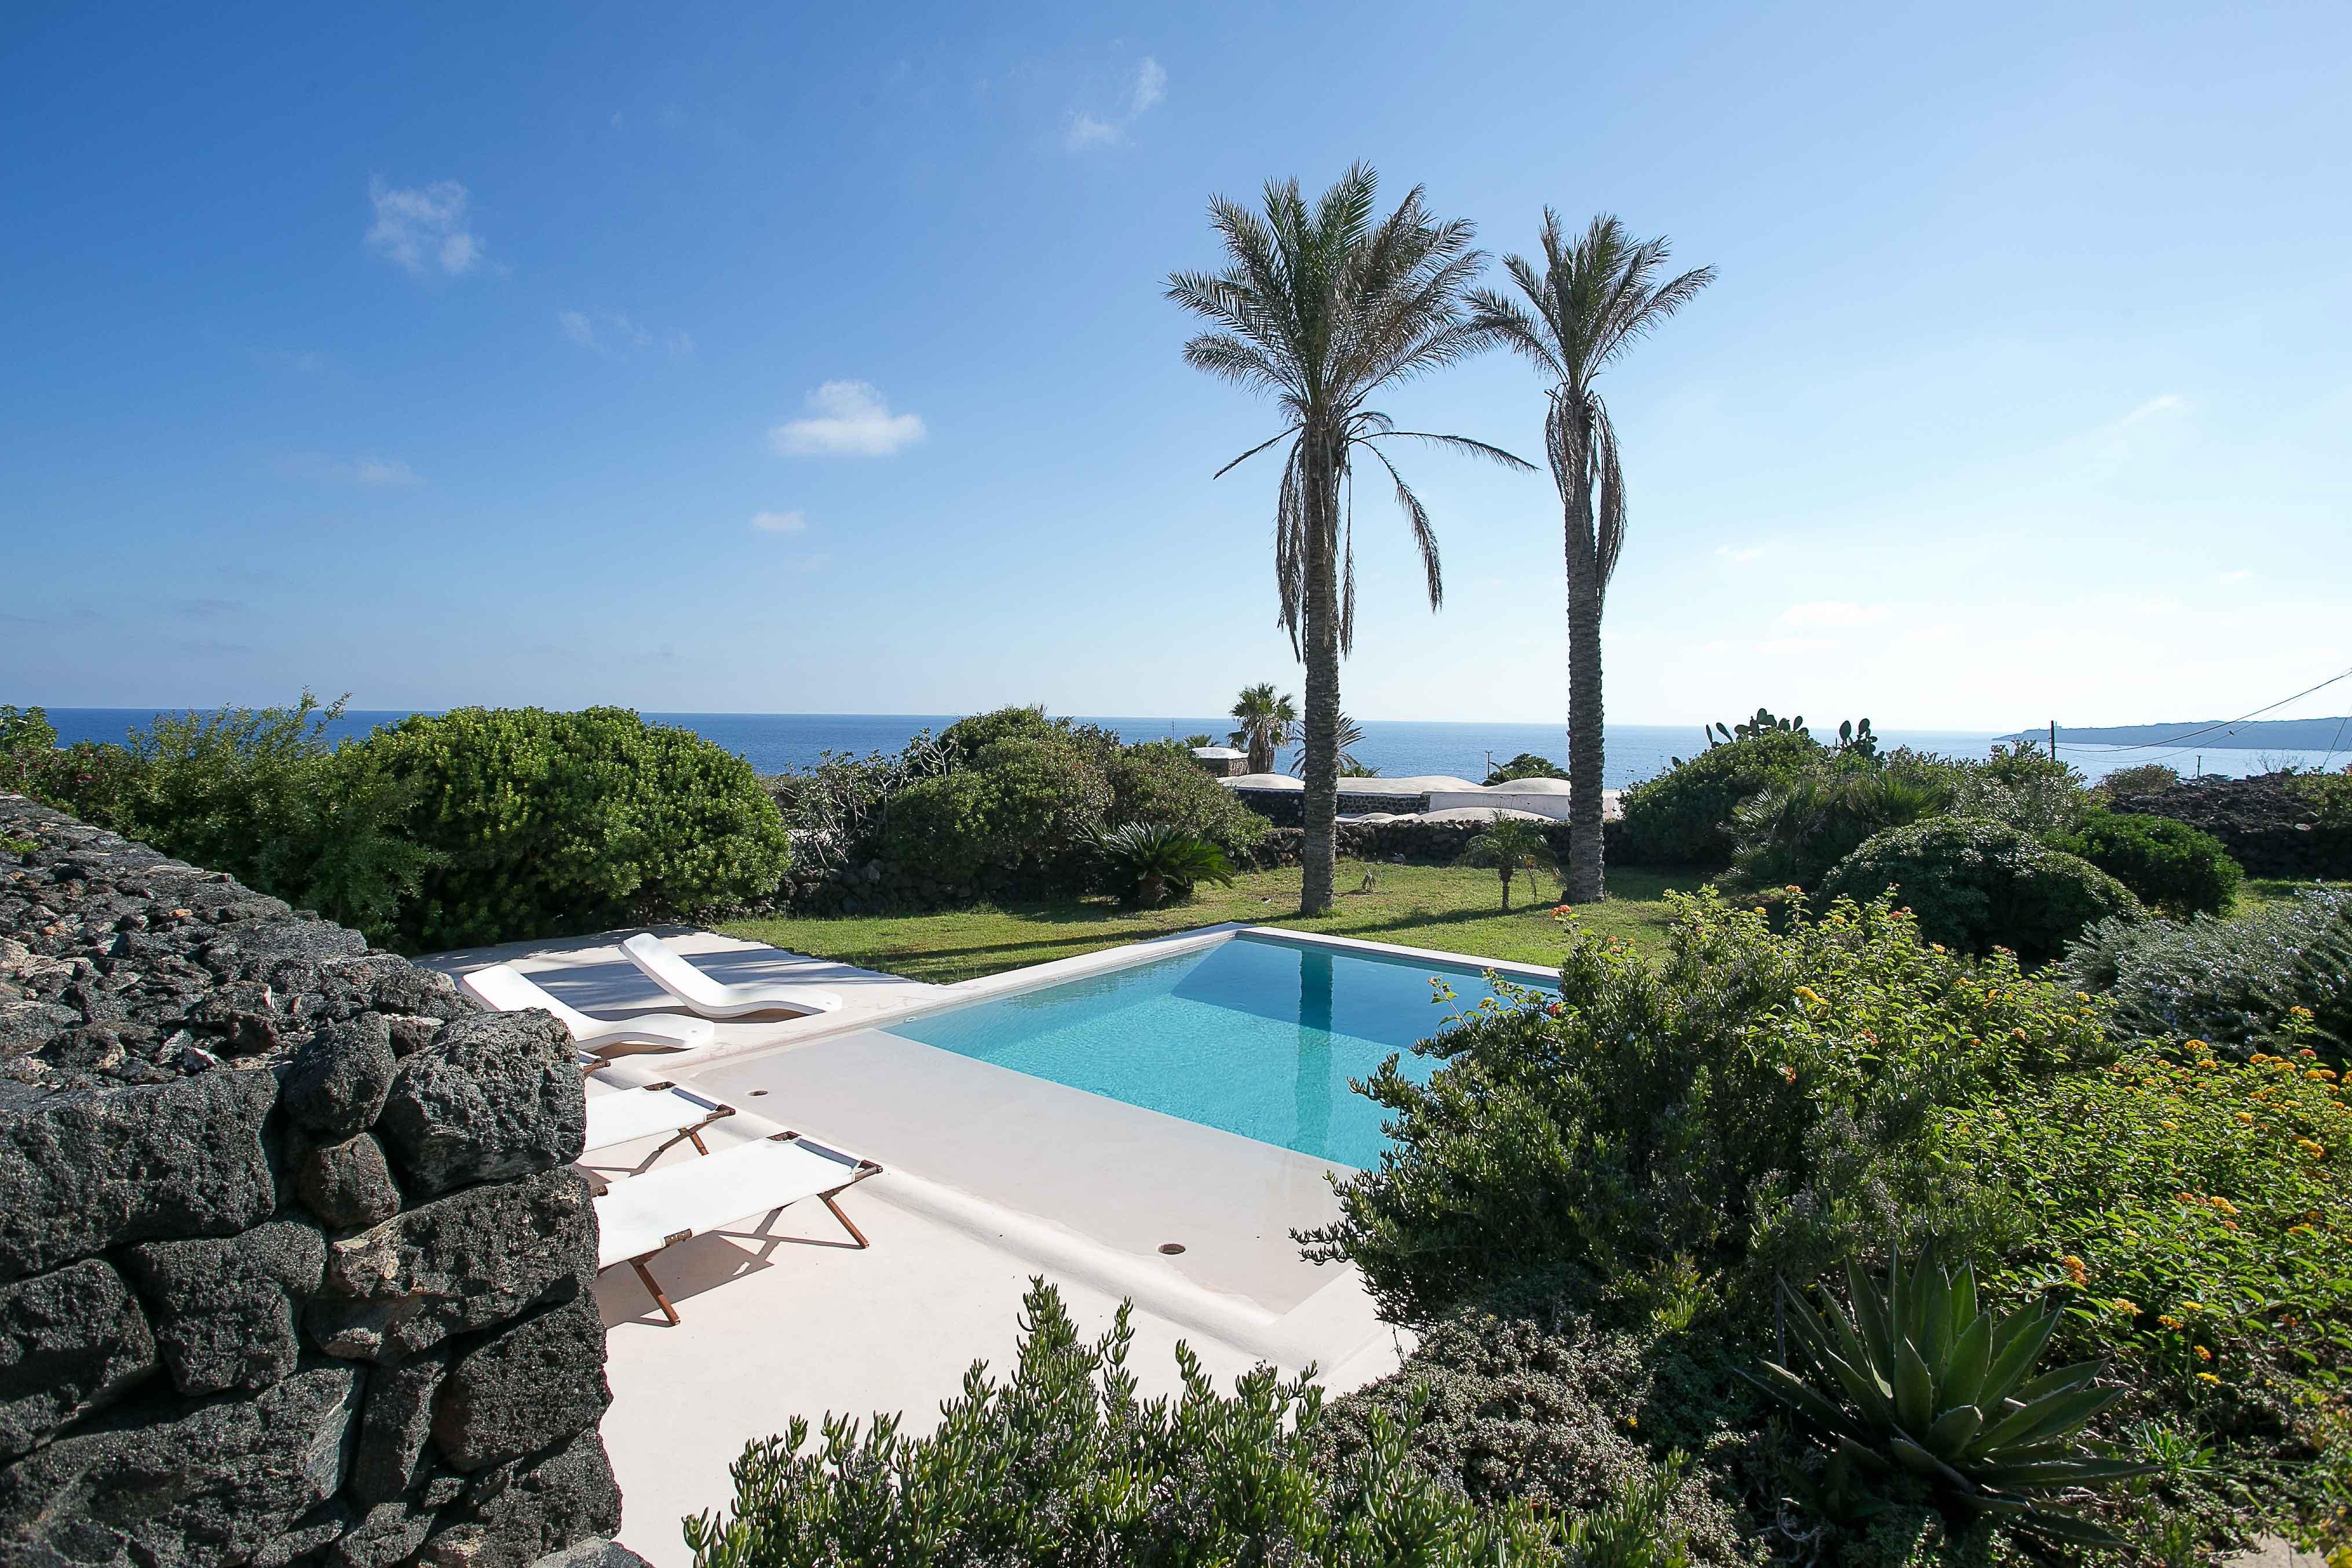 Pietra-Nera-Dammusi-Pantelleria-Affitto-Estate-Vendita-Realestate-Immobiliare-Pantelleria-15